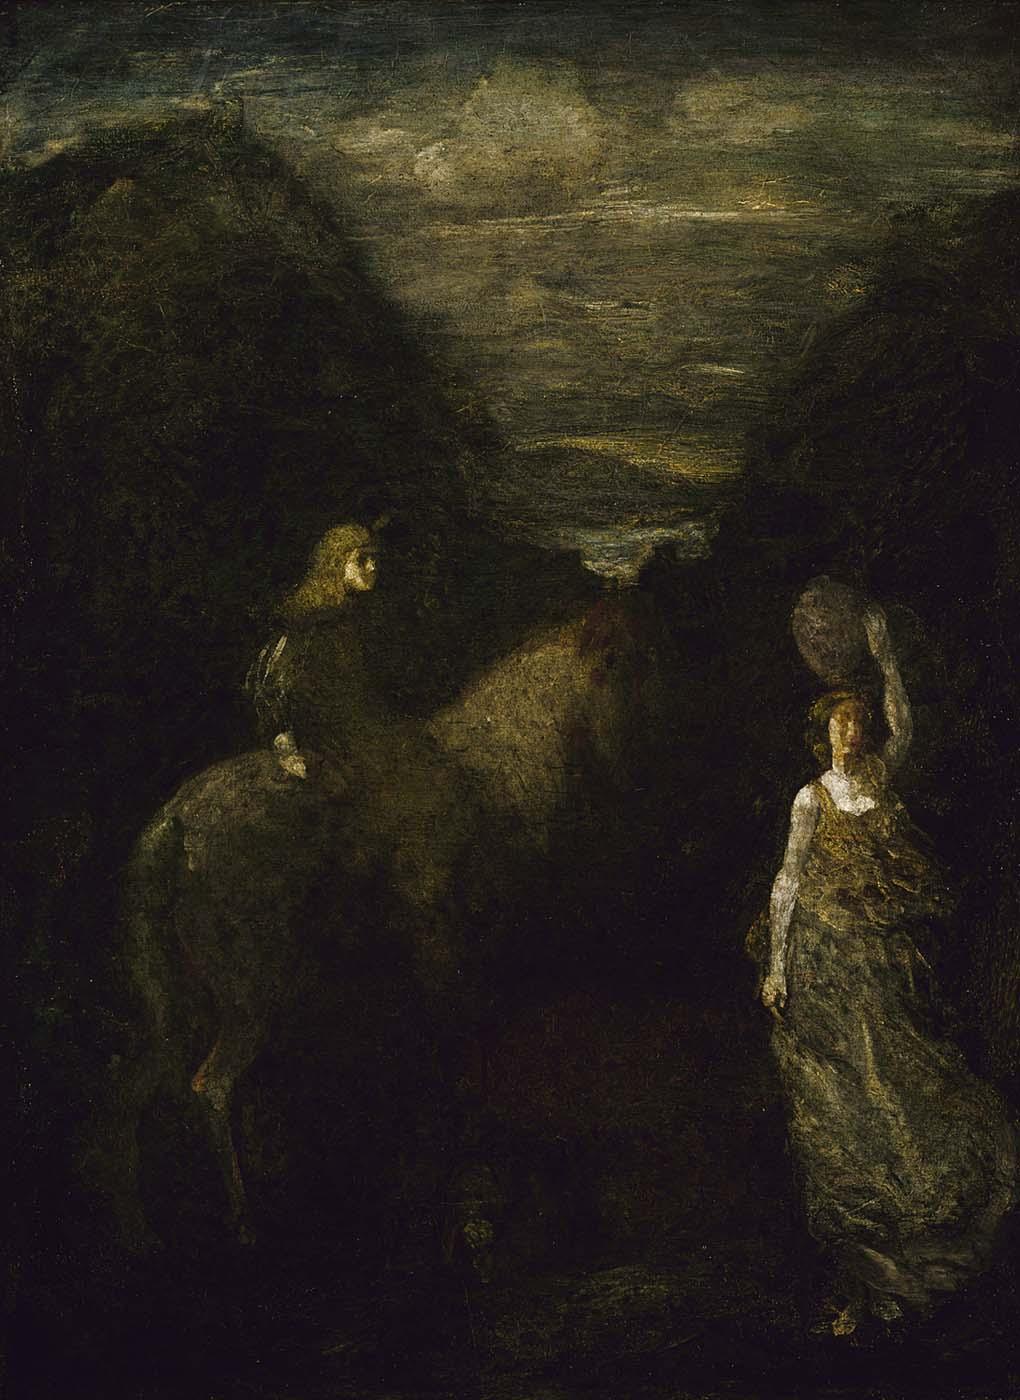 King Cophetua and the Beggar Maid, 1906